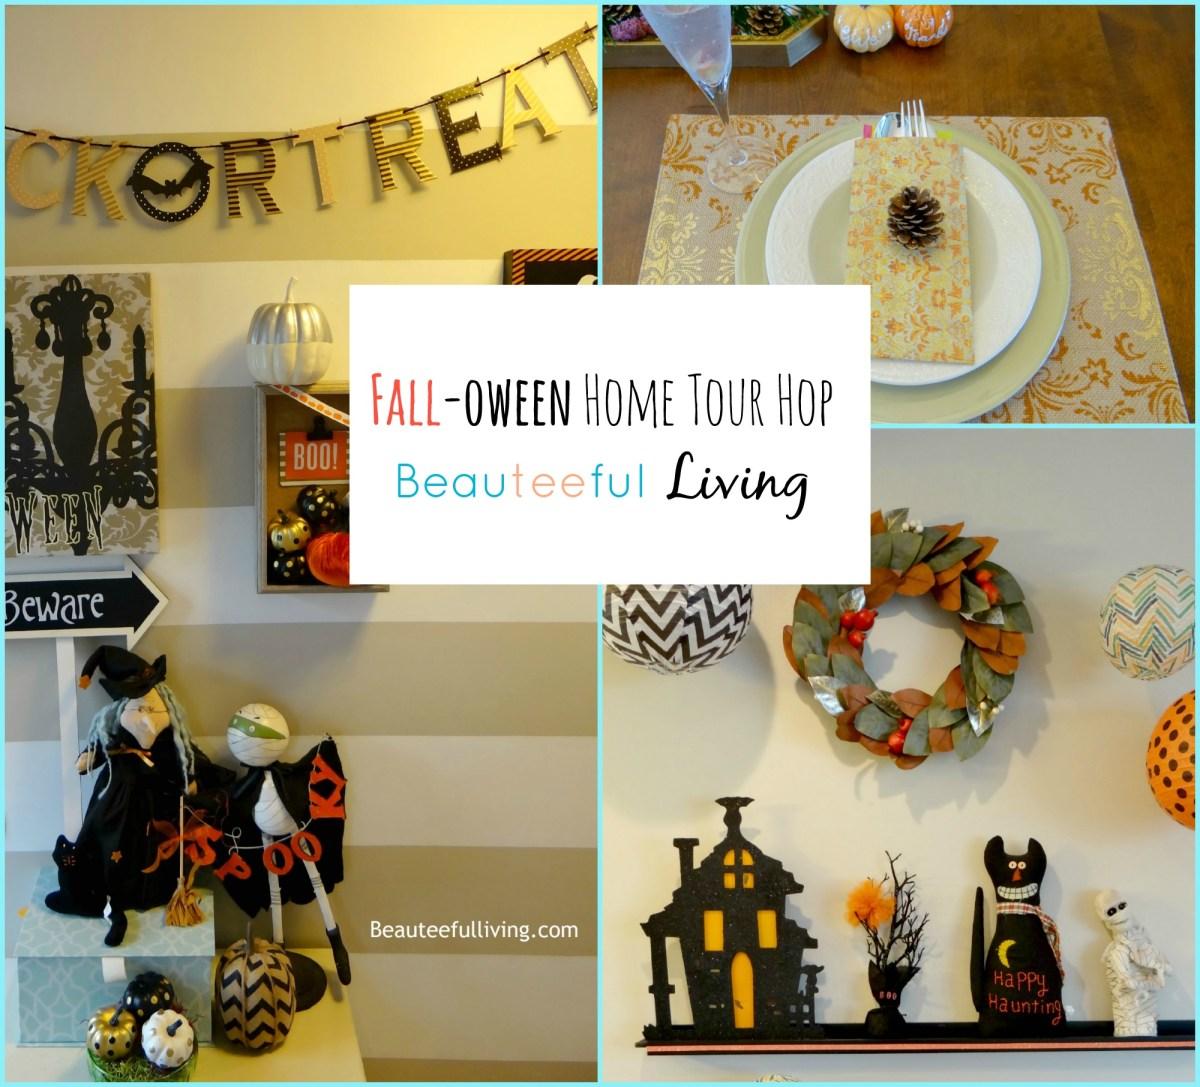 Fall-oween Home Tour - Beauteeful Living